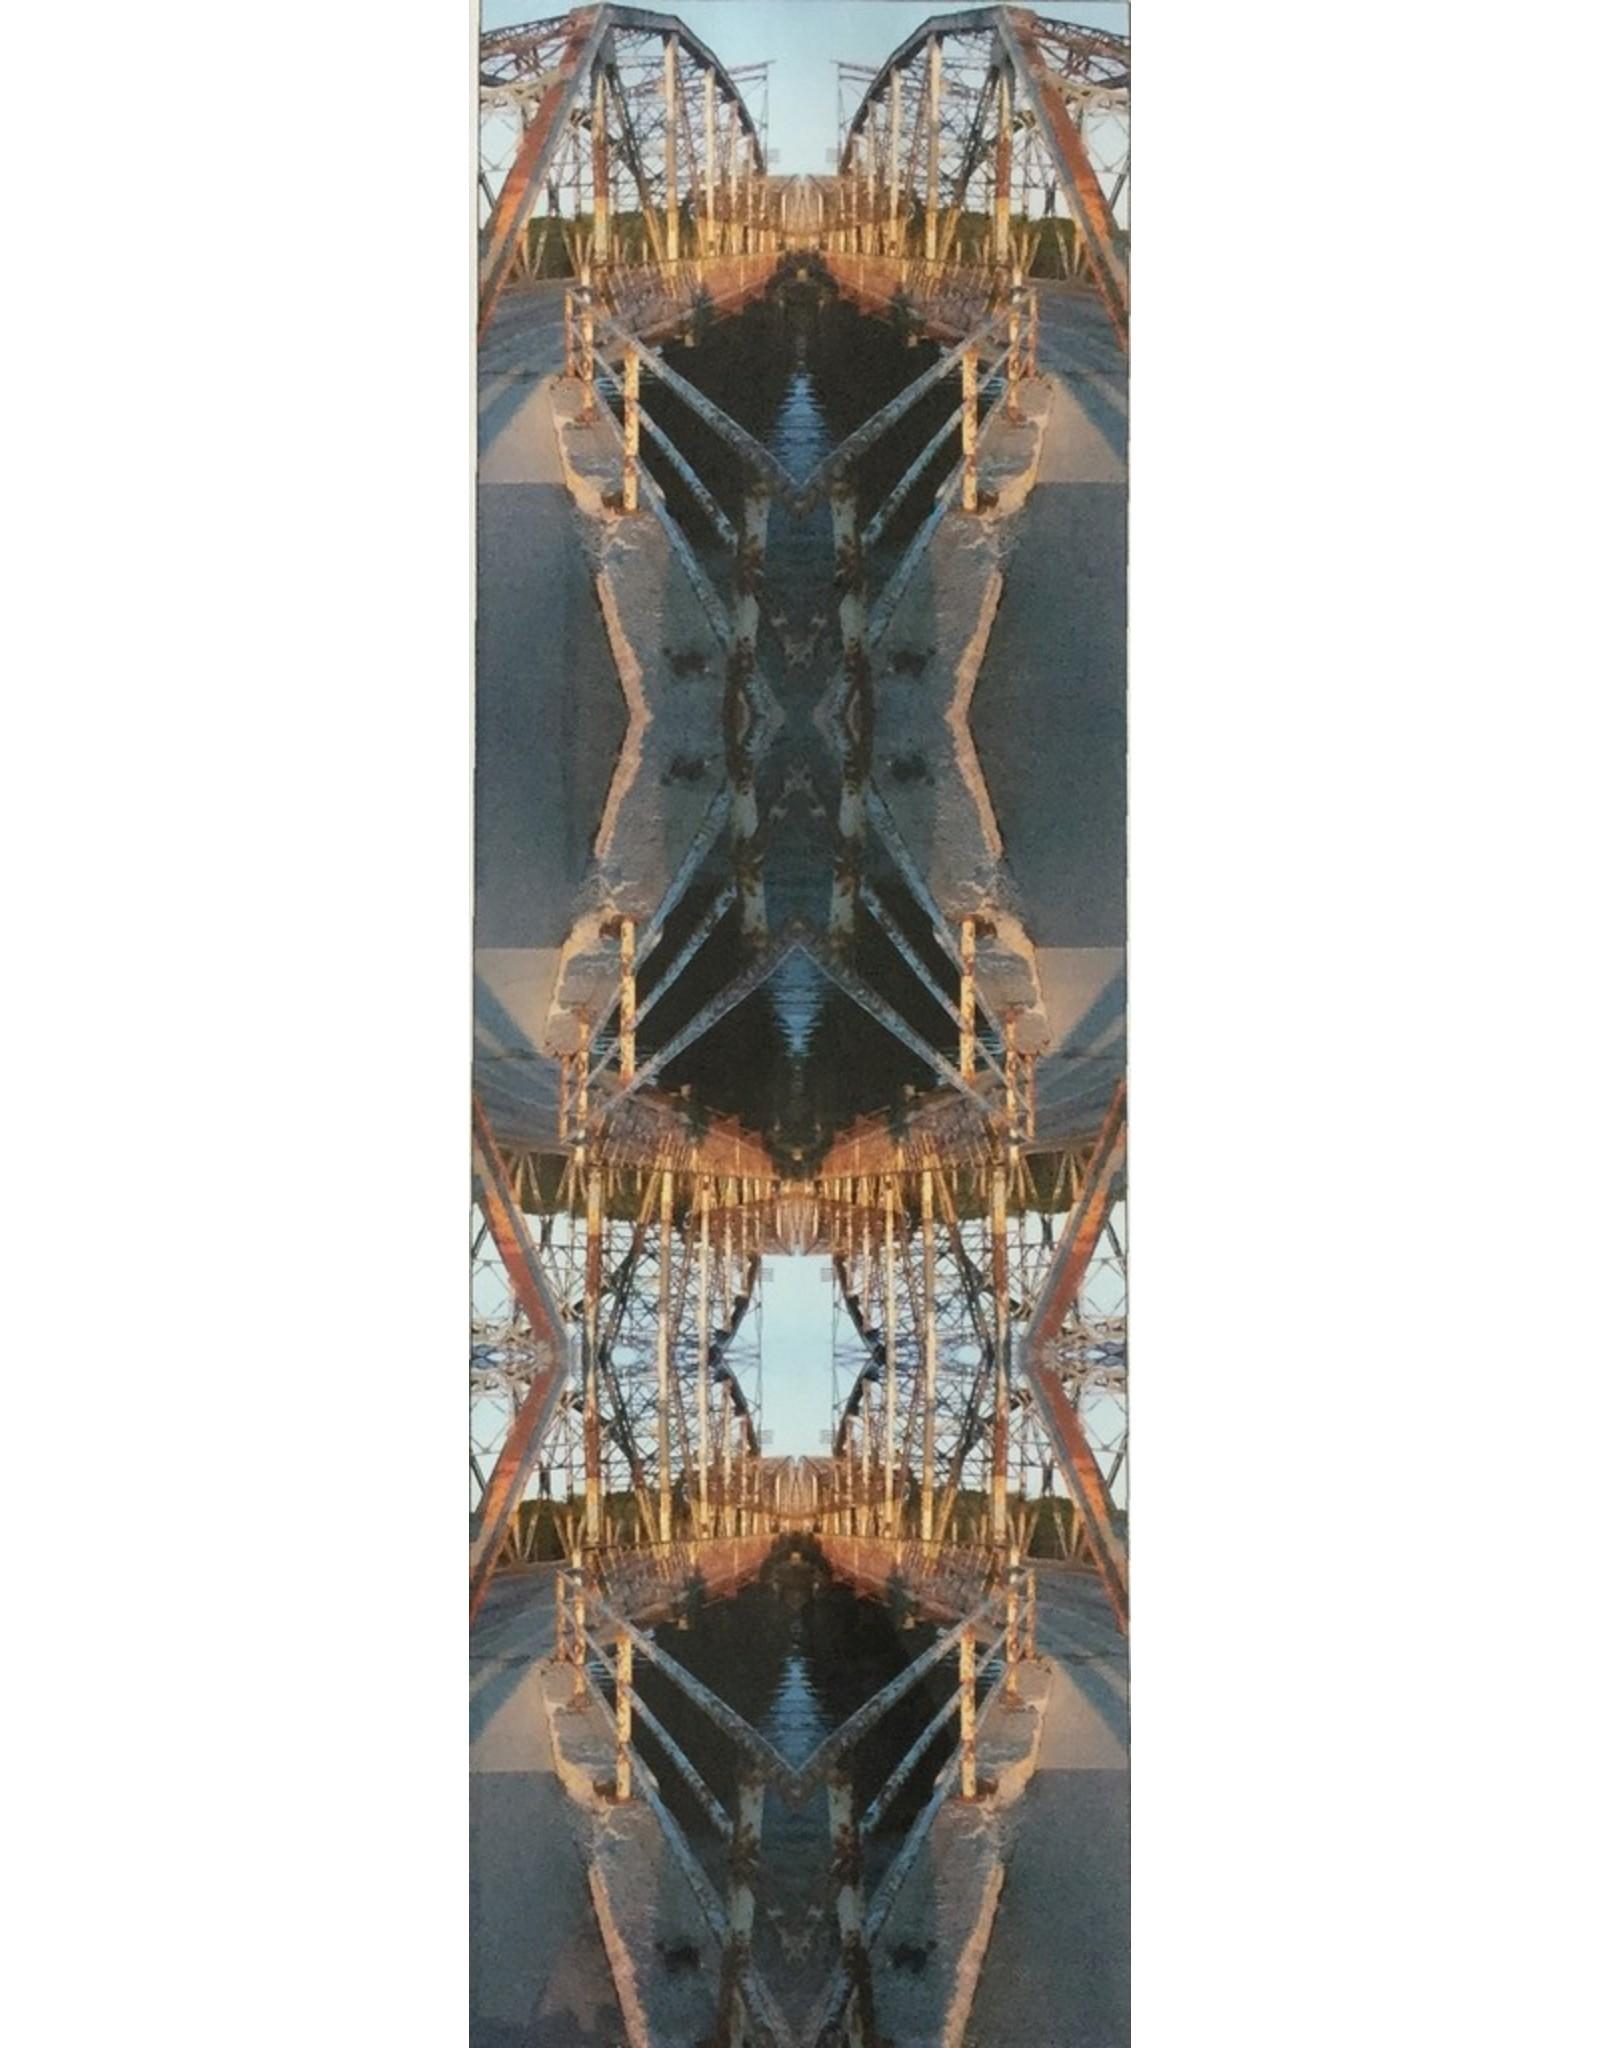 Reichert, Don Redwood Bridge Reconstruction, Don Reichert